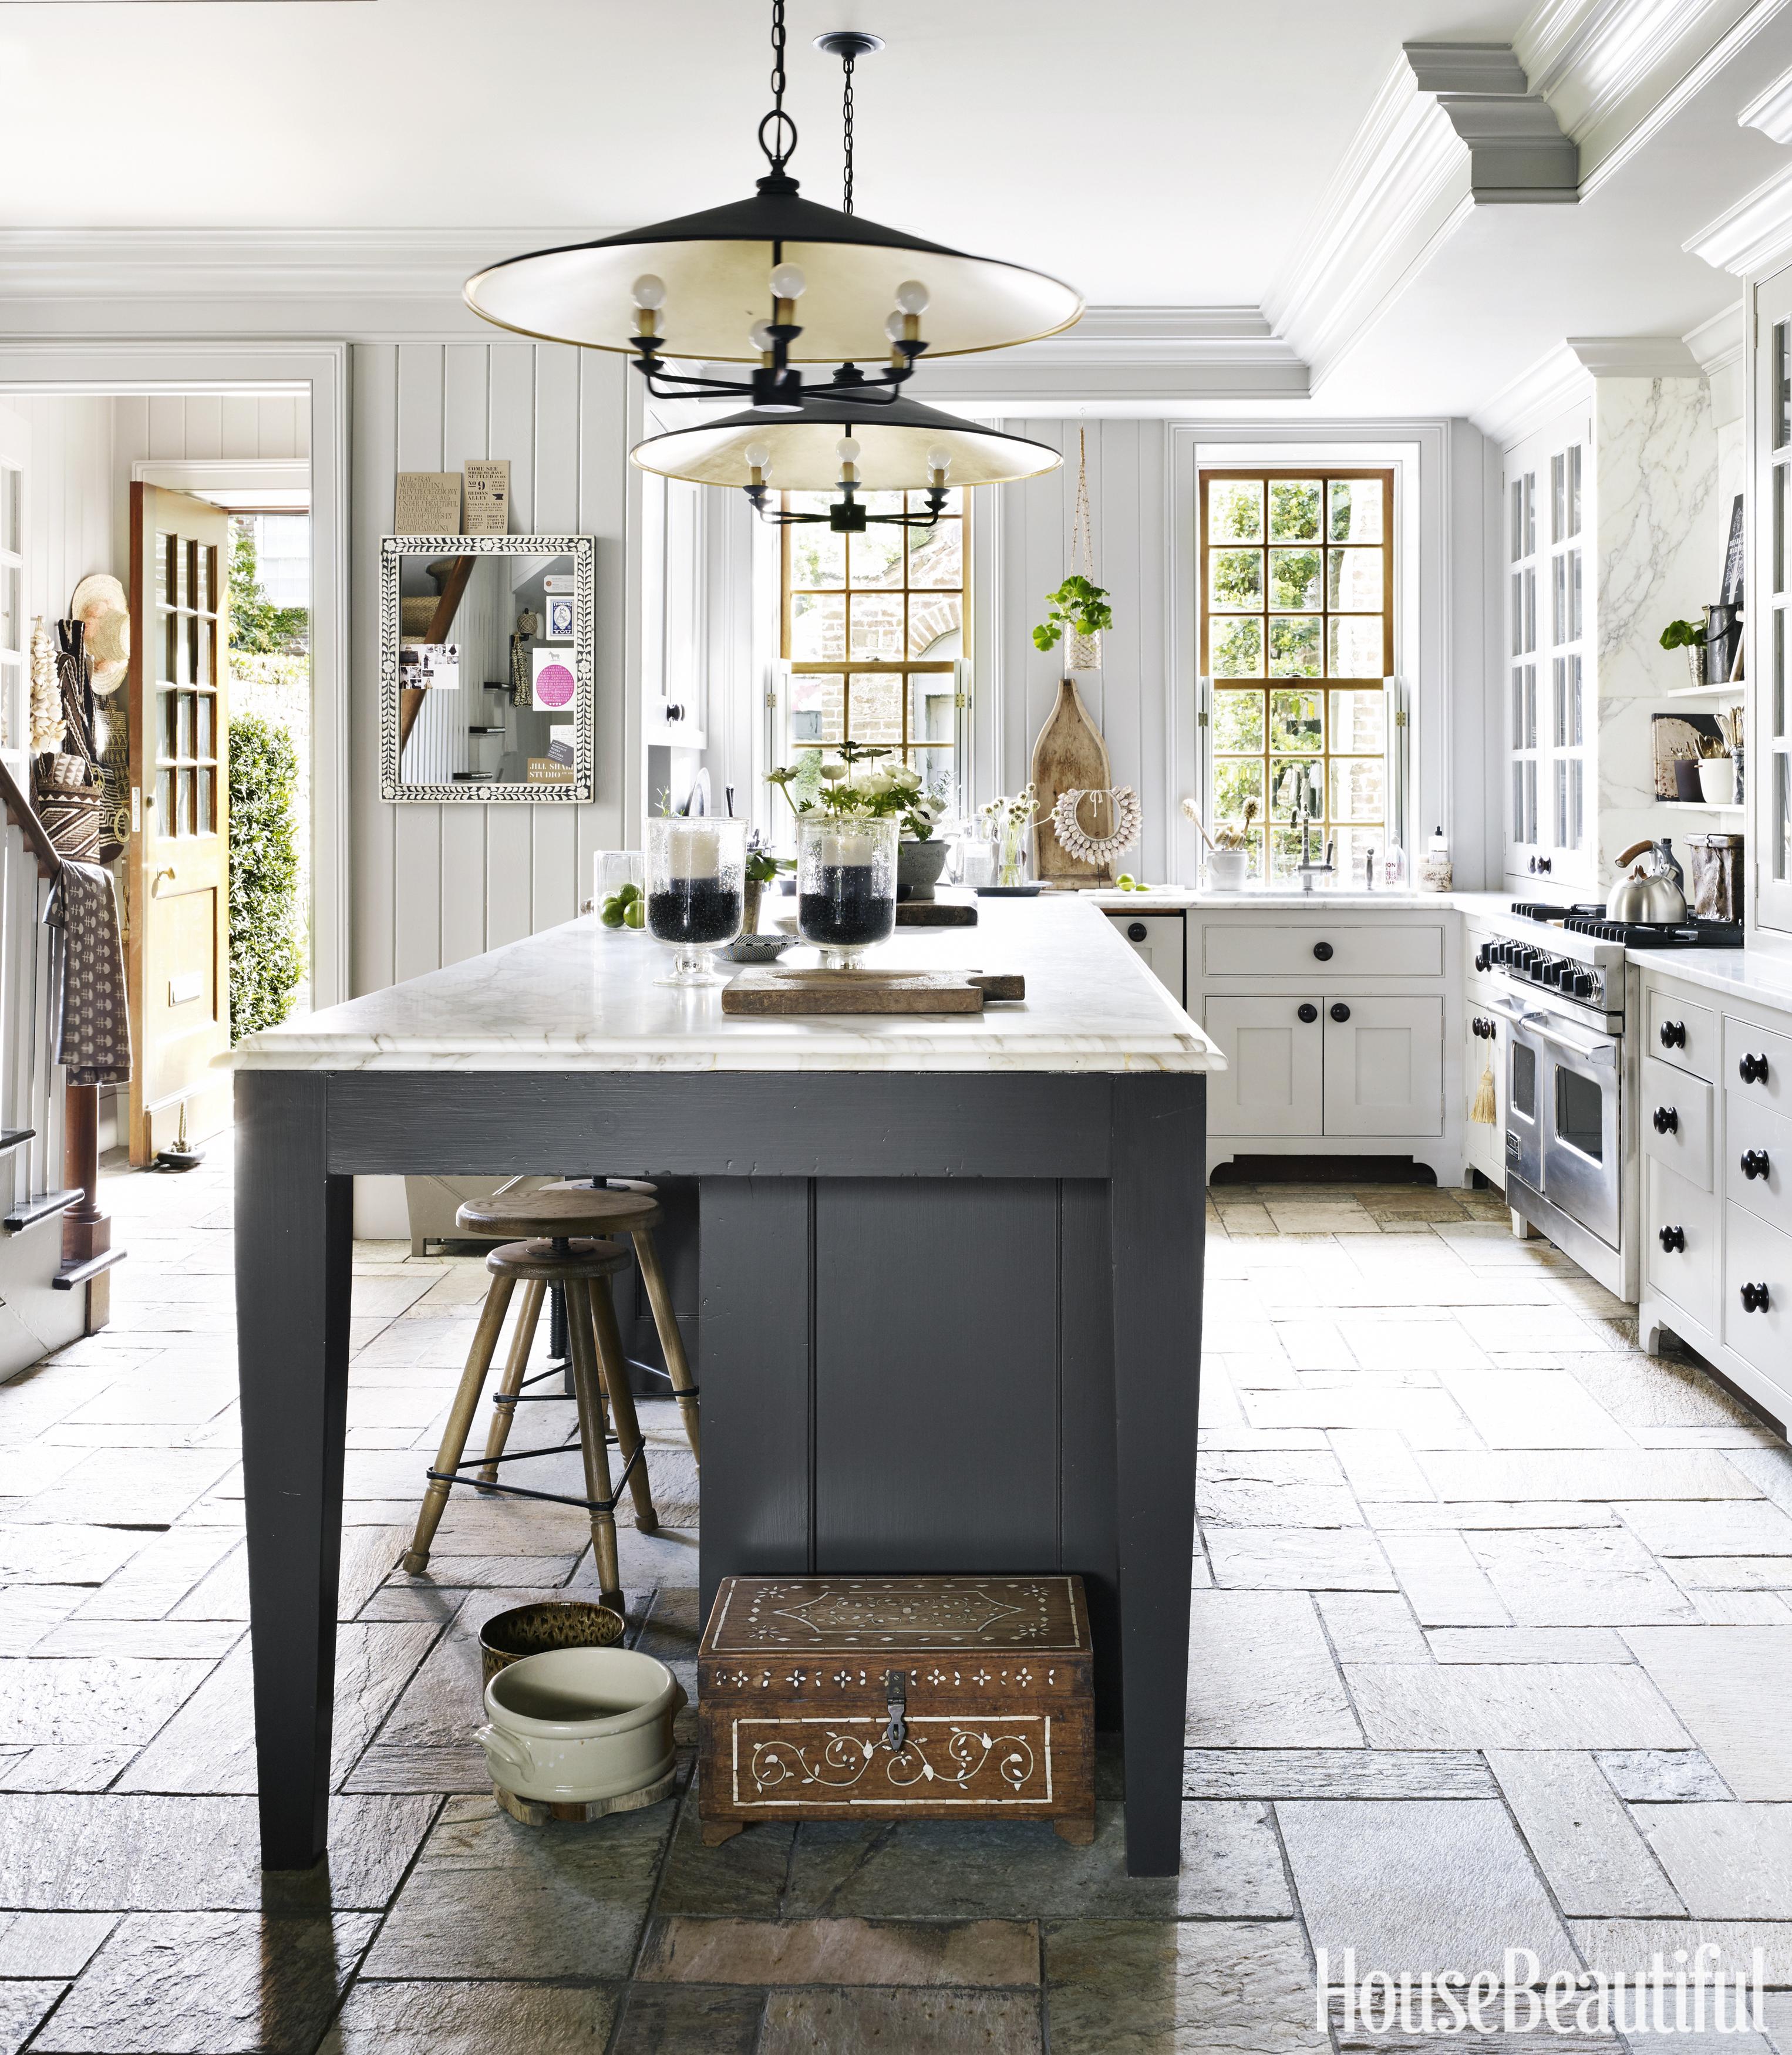 100+ Kitchen Design & Remodeling Ideas